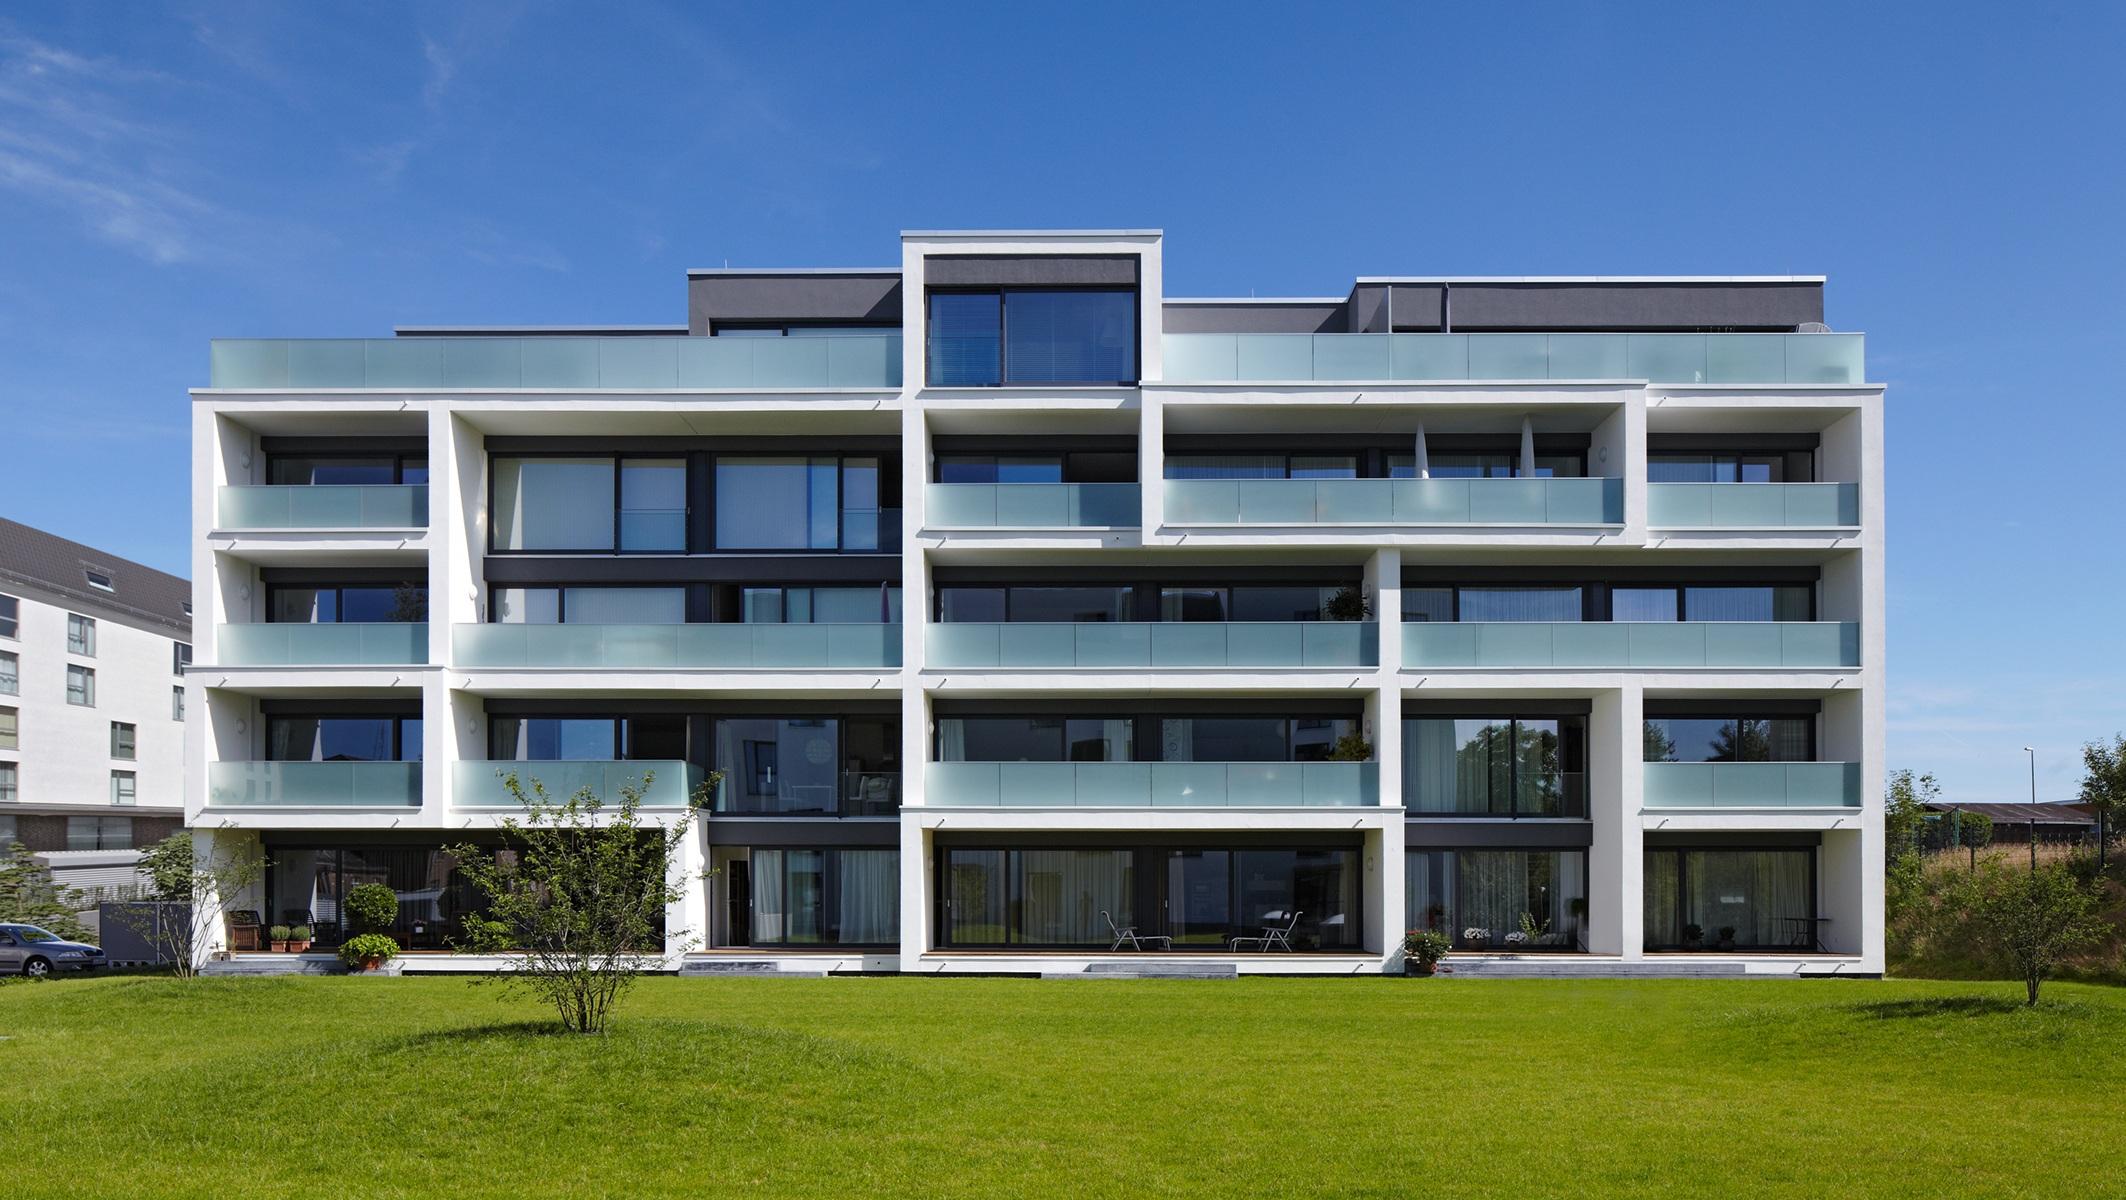 esfandiary-möller-architekten_Haus-A-D_Süd.jpg